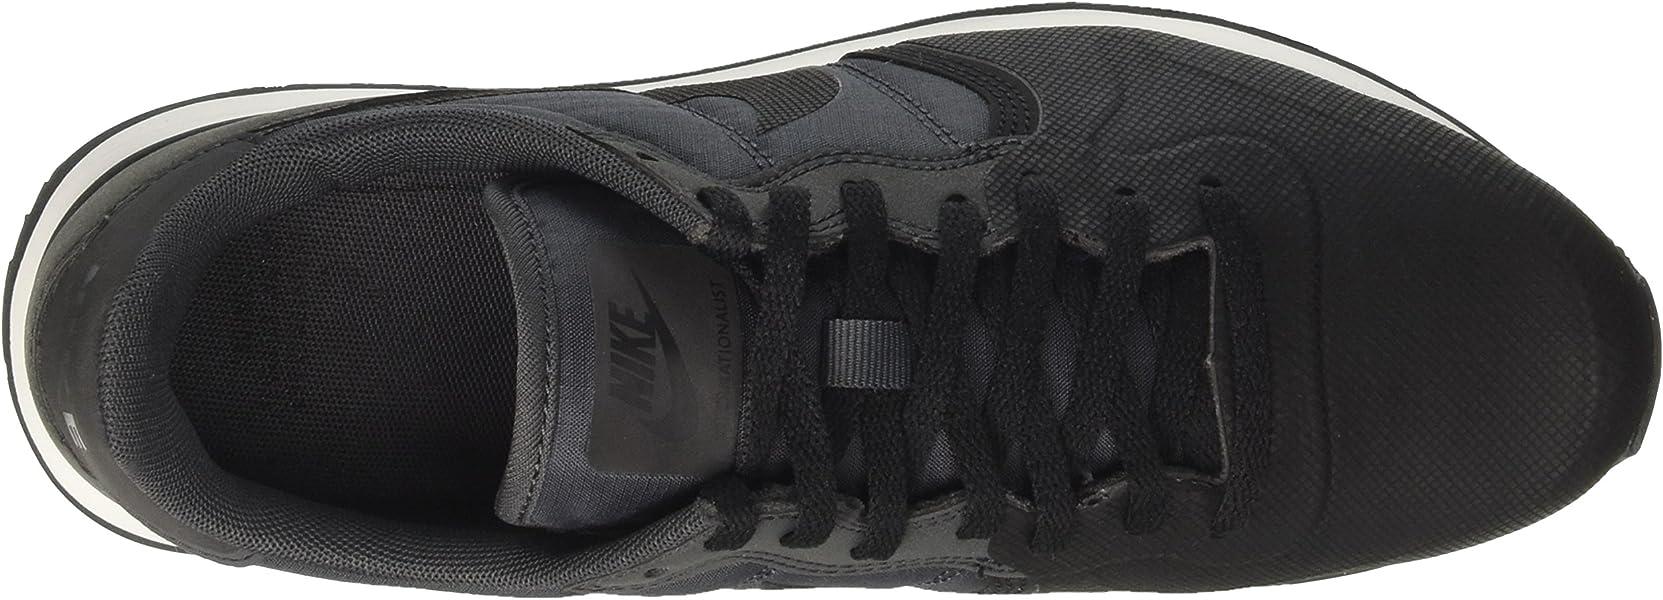 promo code aa7bf 31984 NIKE Air Max Uptempo Fuse 360 Mens Basketball Shoes 555103-002